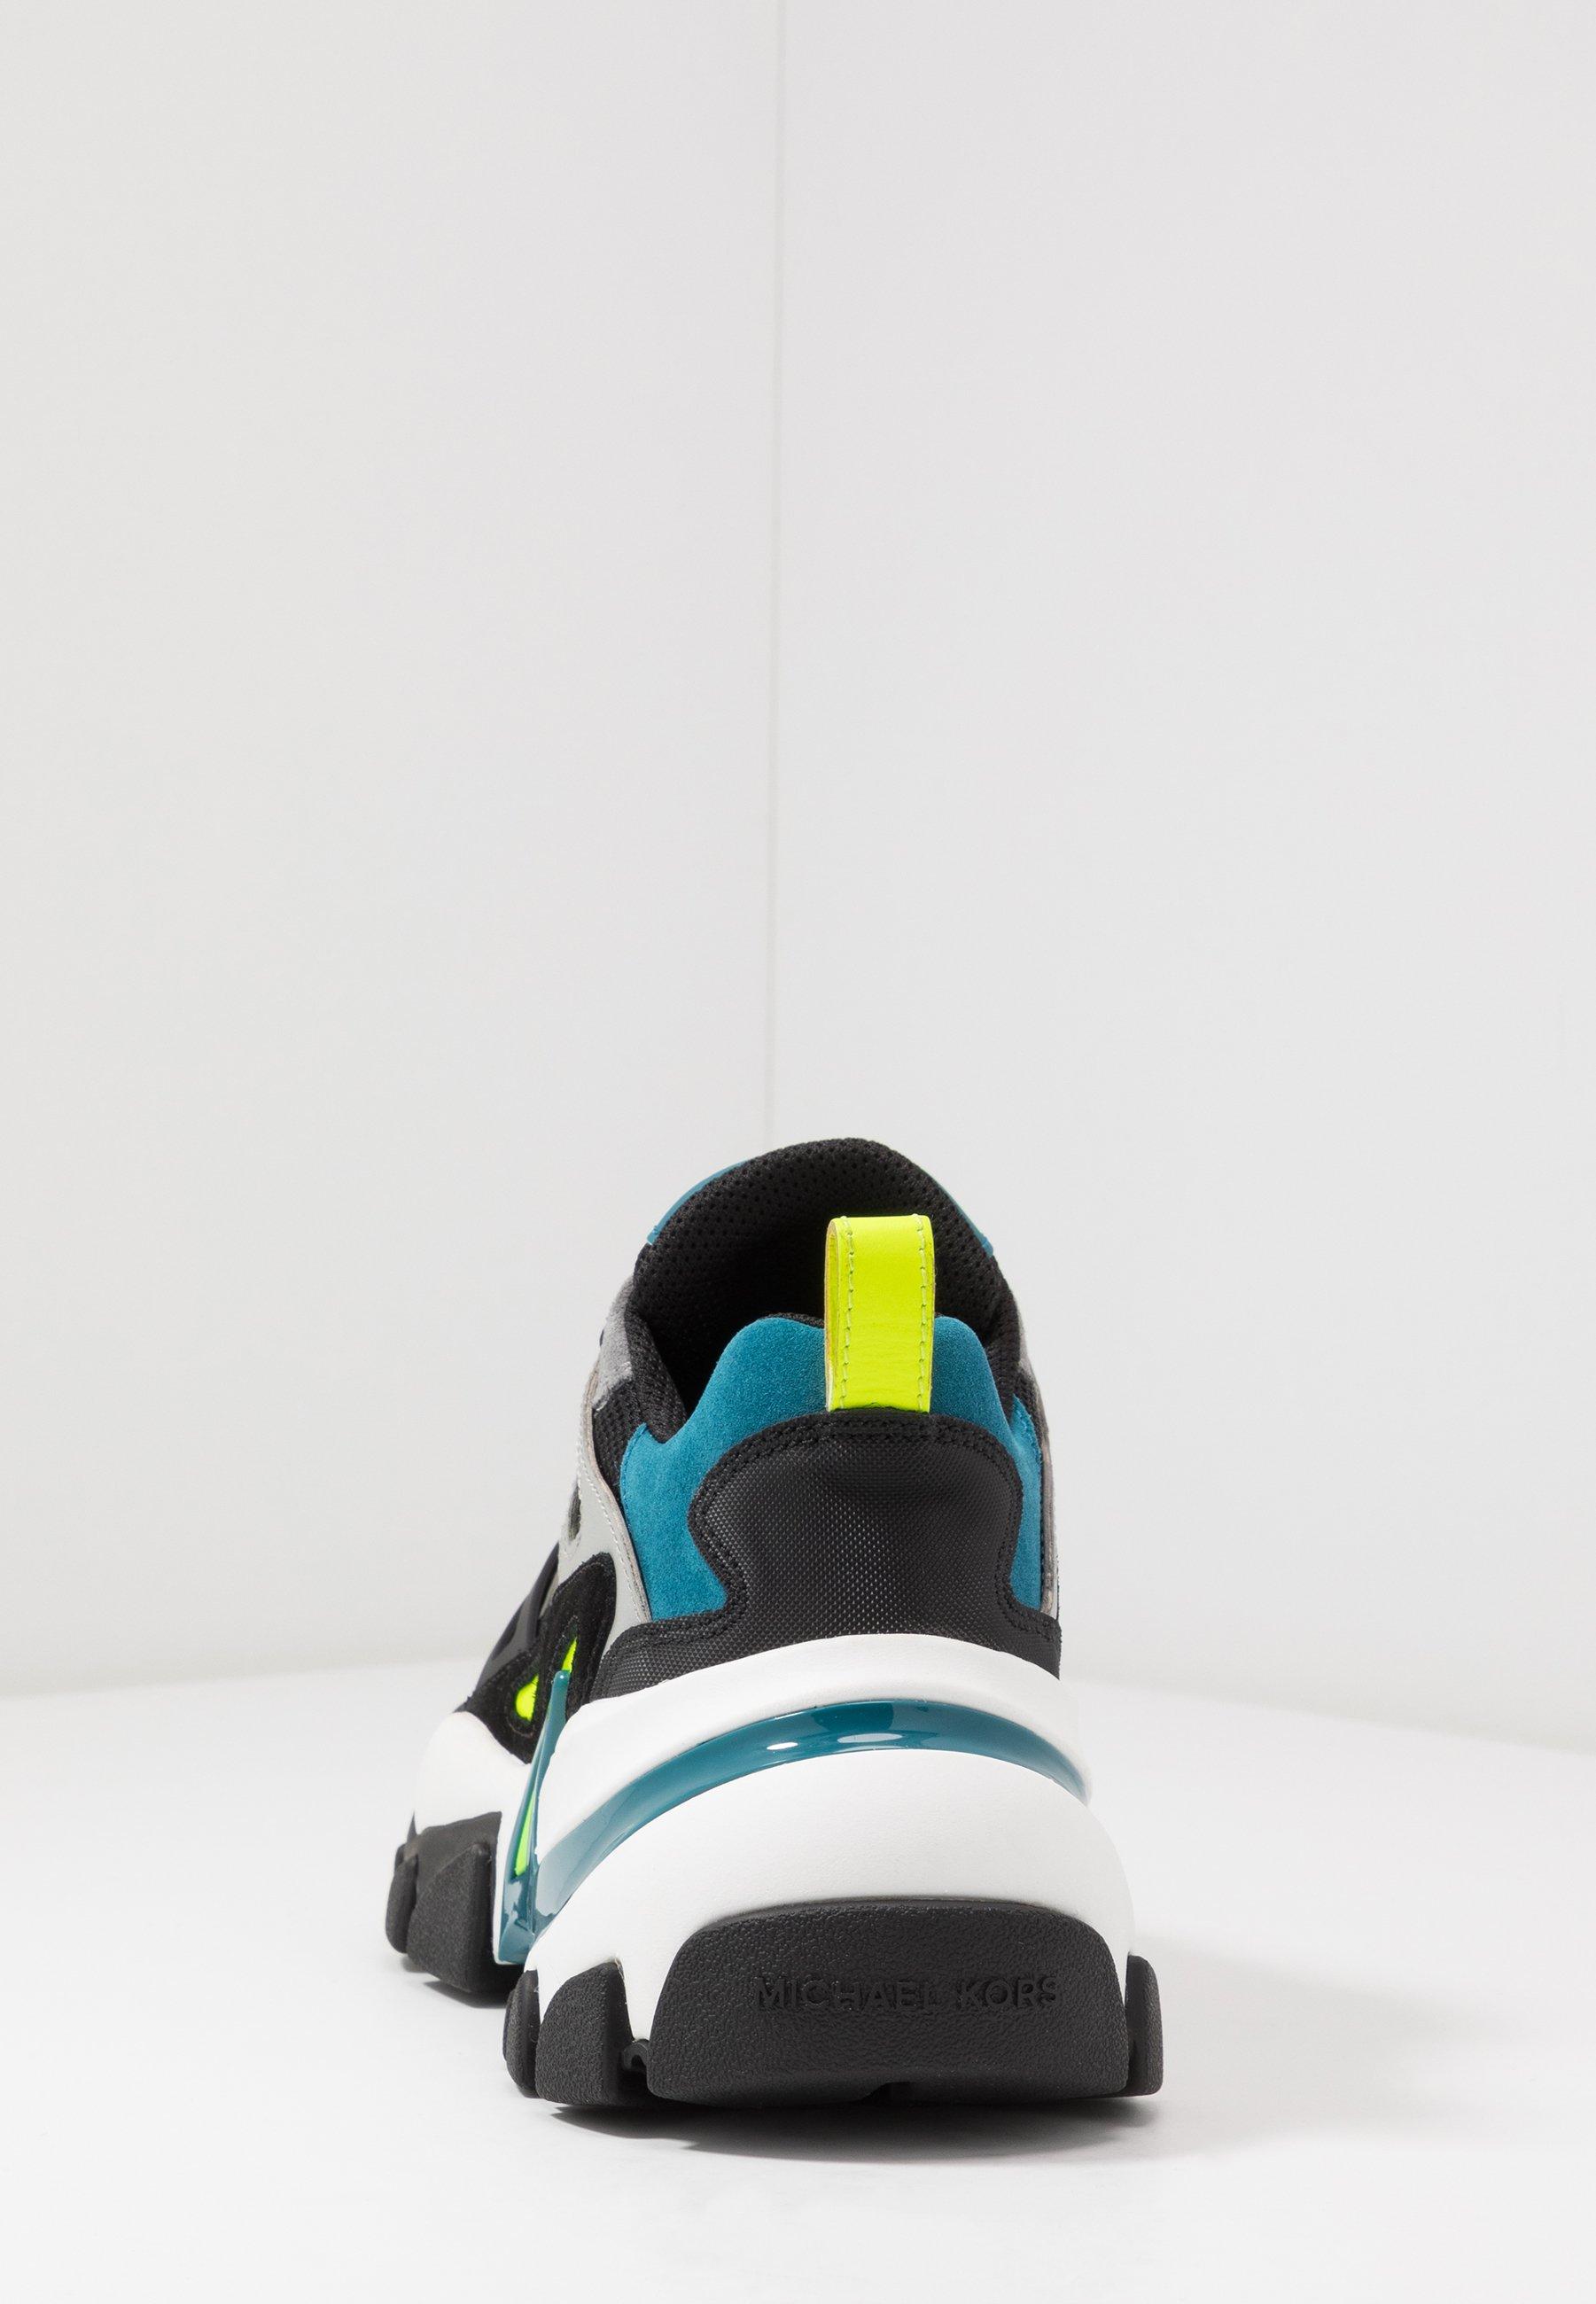 Michael Kors NICK - Trainers - neon lemon